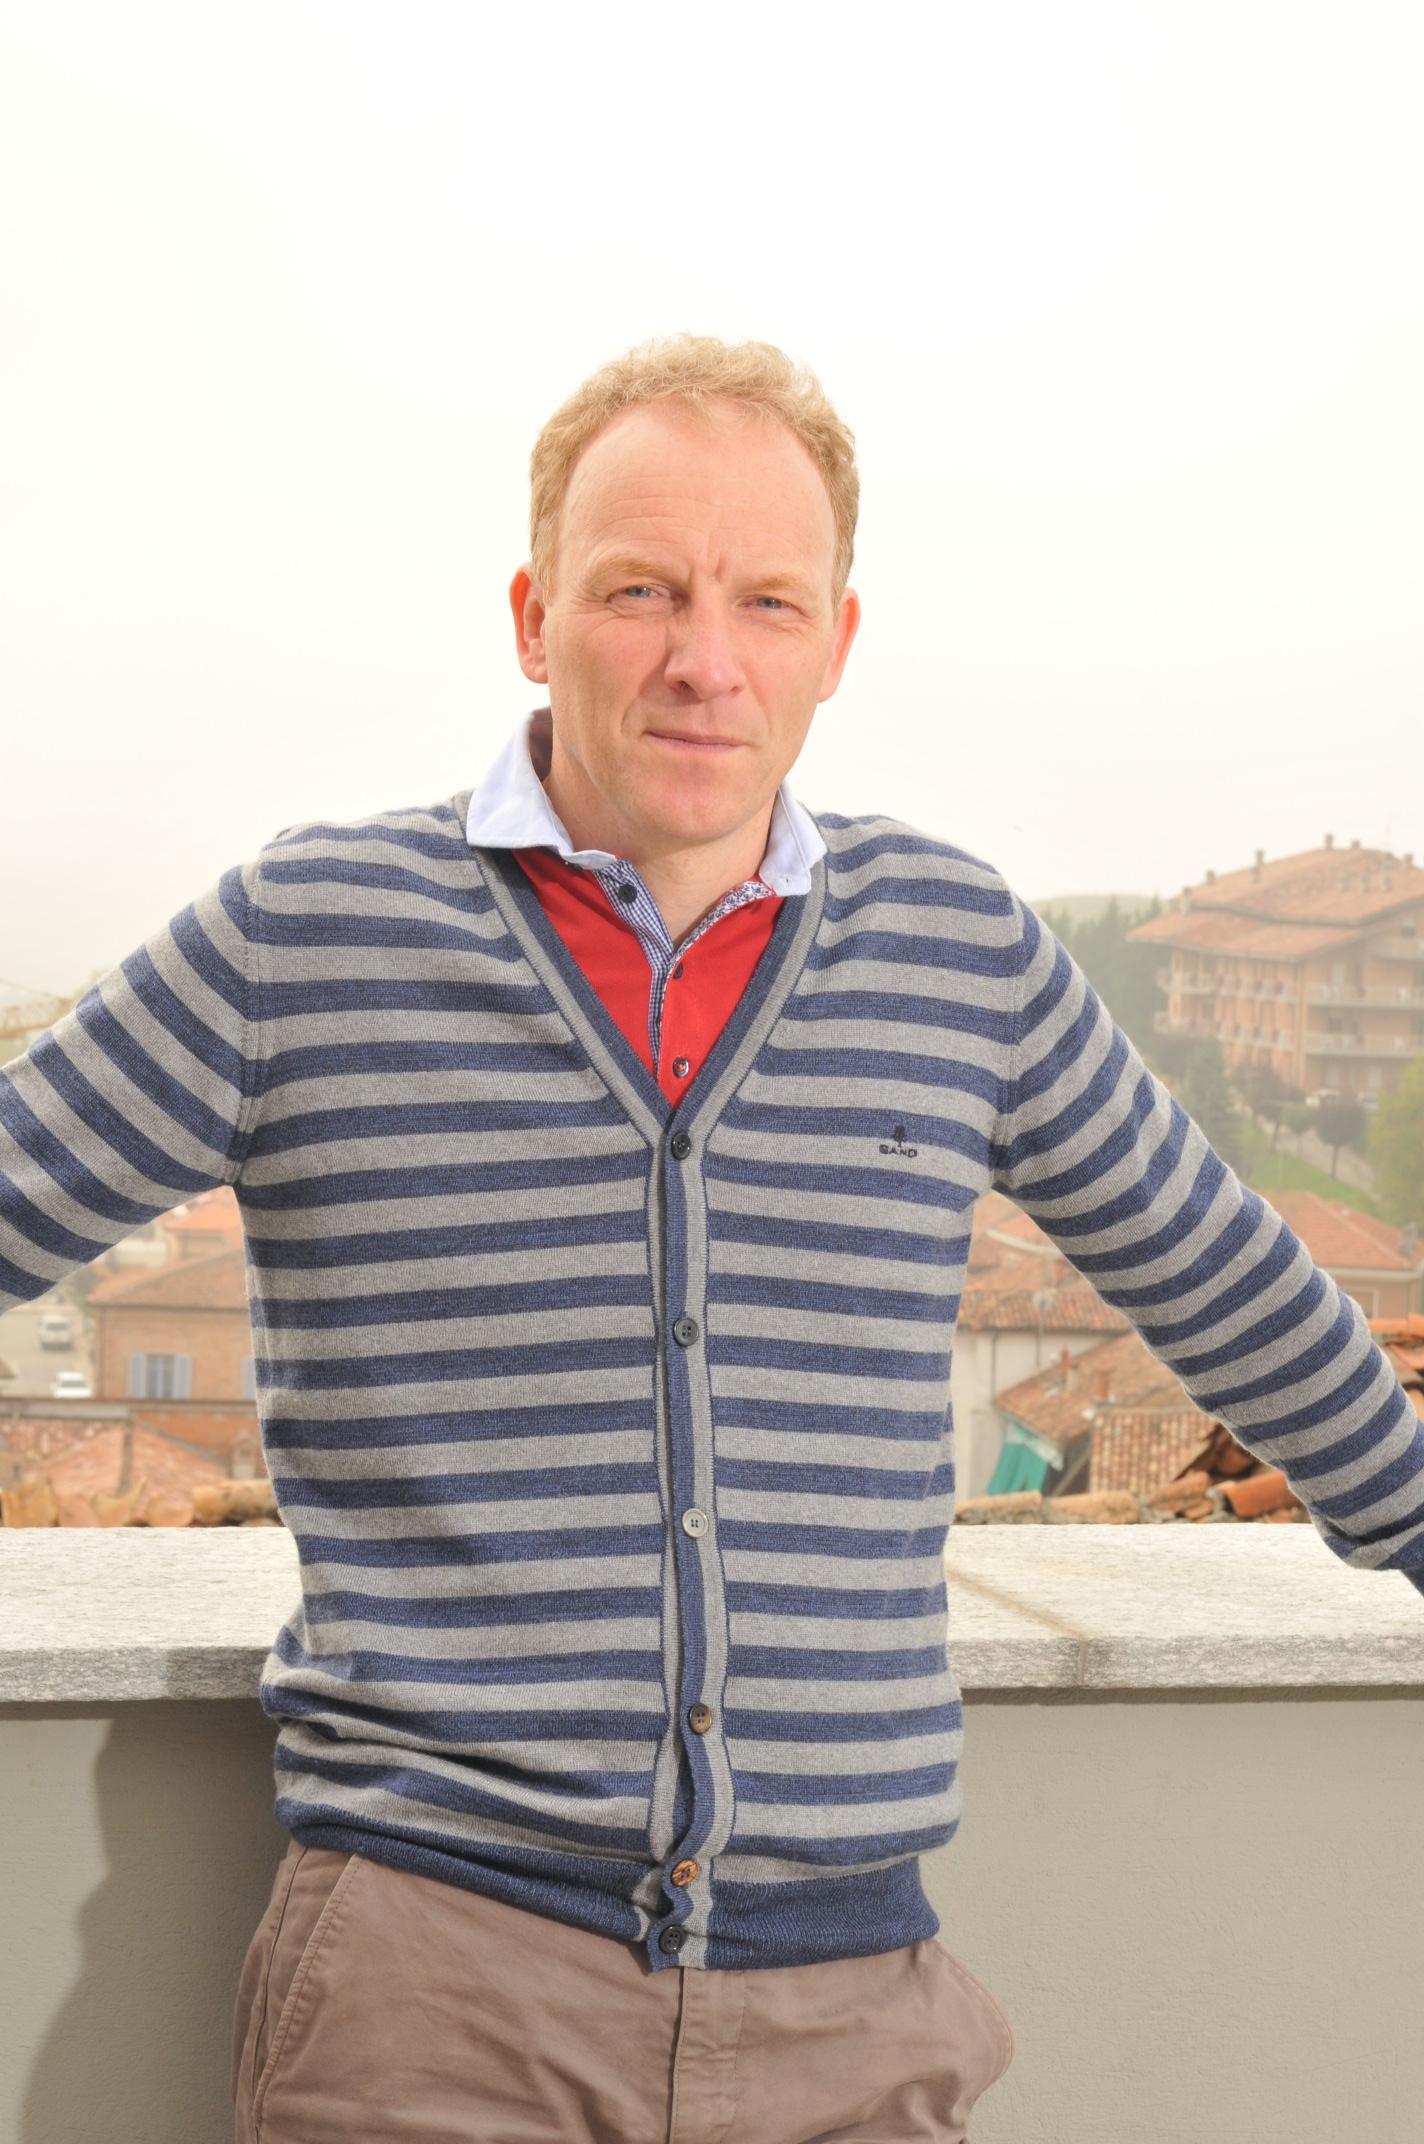 jon-kalman-stefansson-premio-bottari-lattes-2012